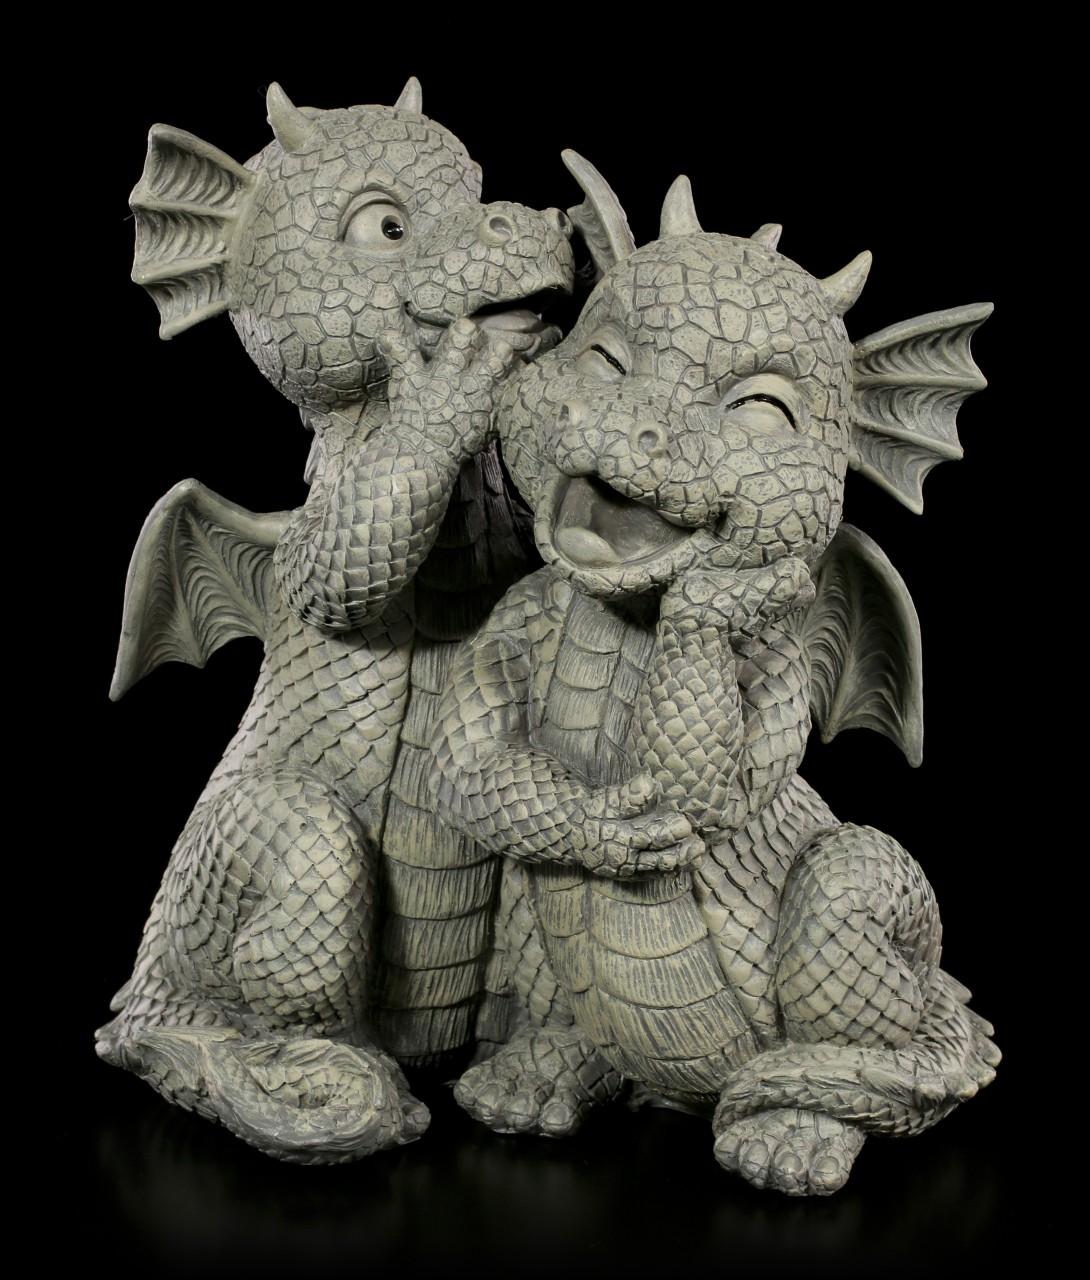 Dragon Couple Garden Figurines - Love Whispers